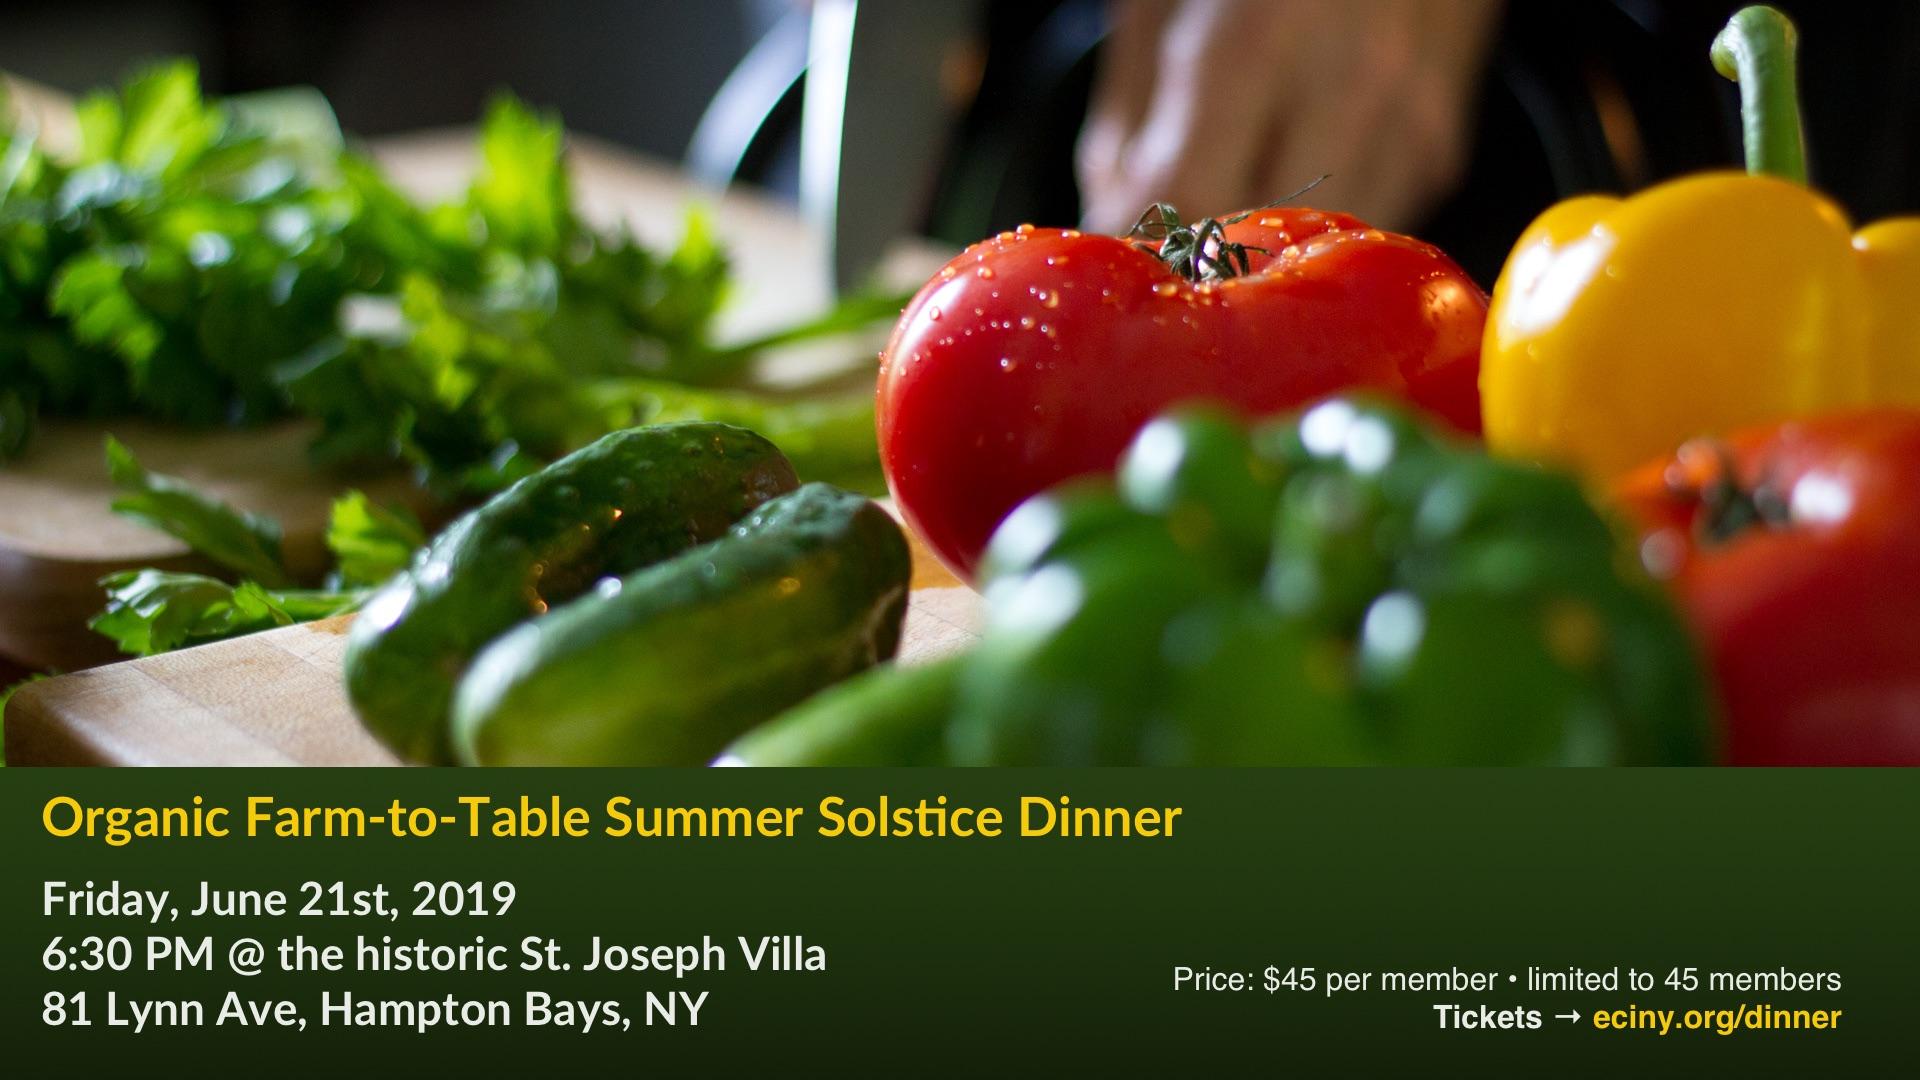 Organic Farm-to-Table Summer Solstice Dinner - Jun 21, 2019 - FB cover 1920x1080.jpg